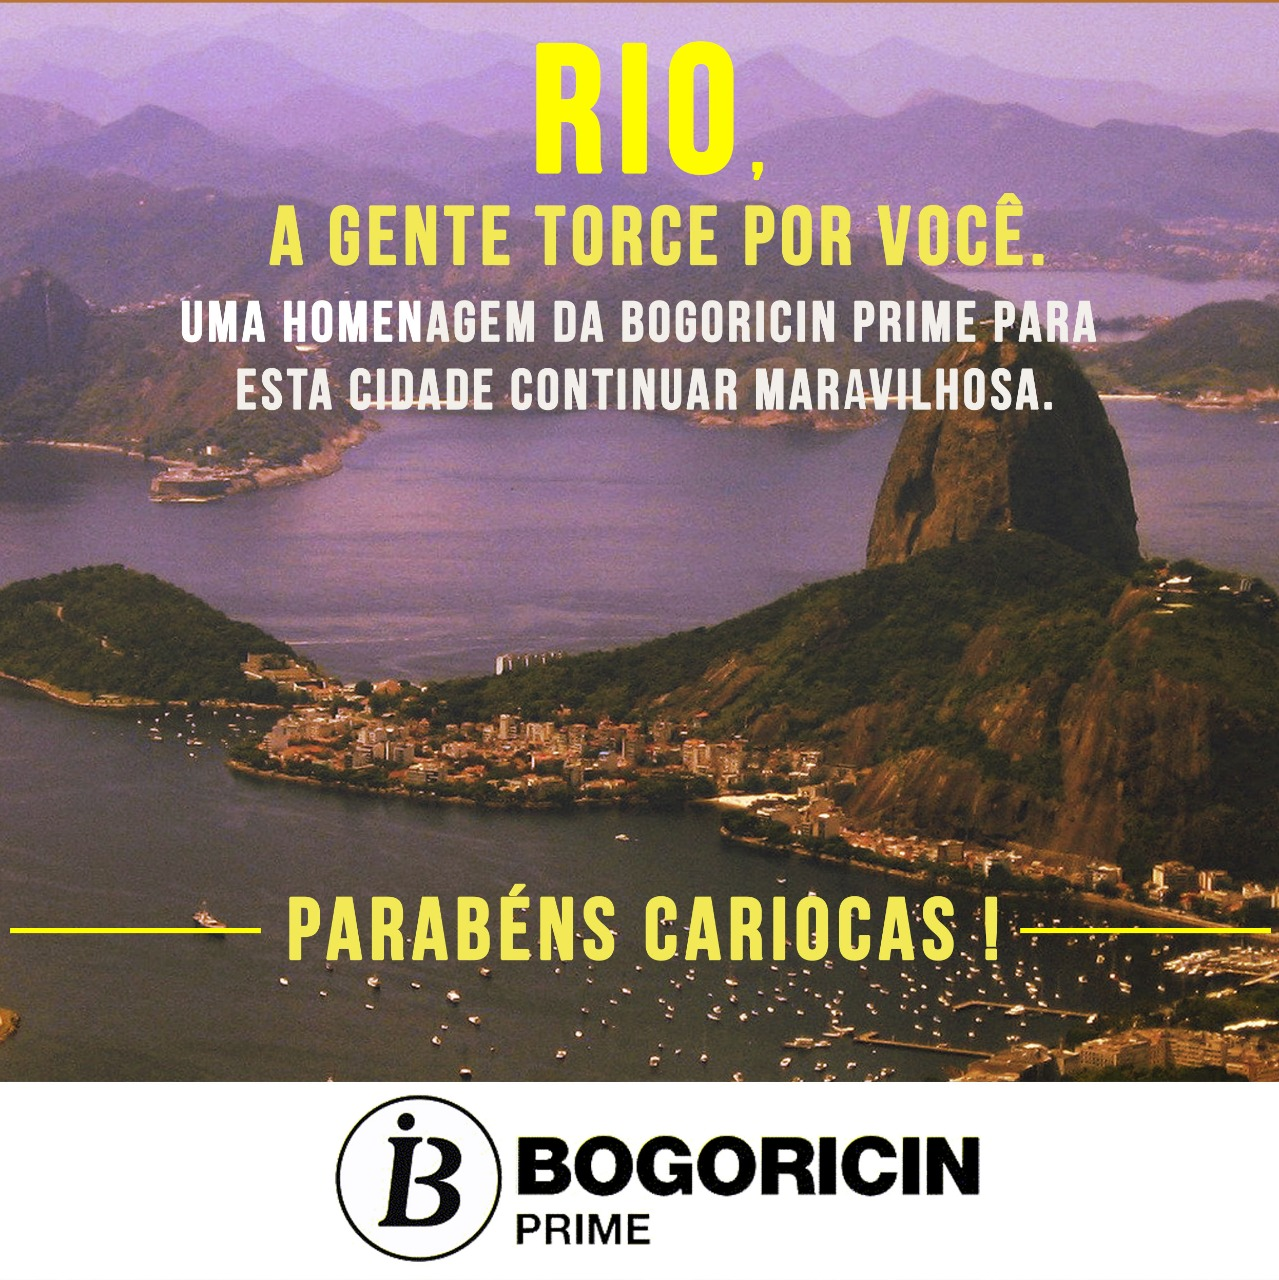 Feliz aniversario Rio de Janeiro